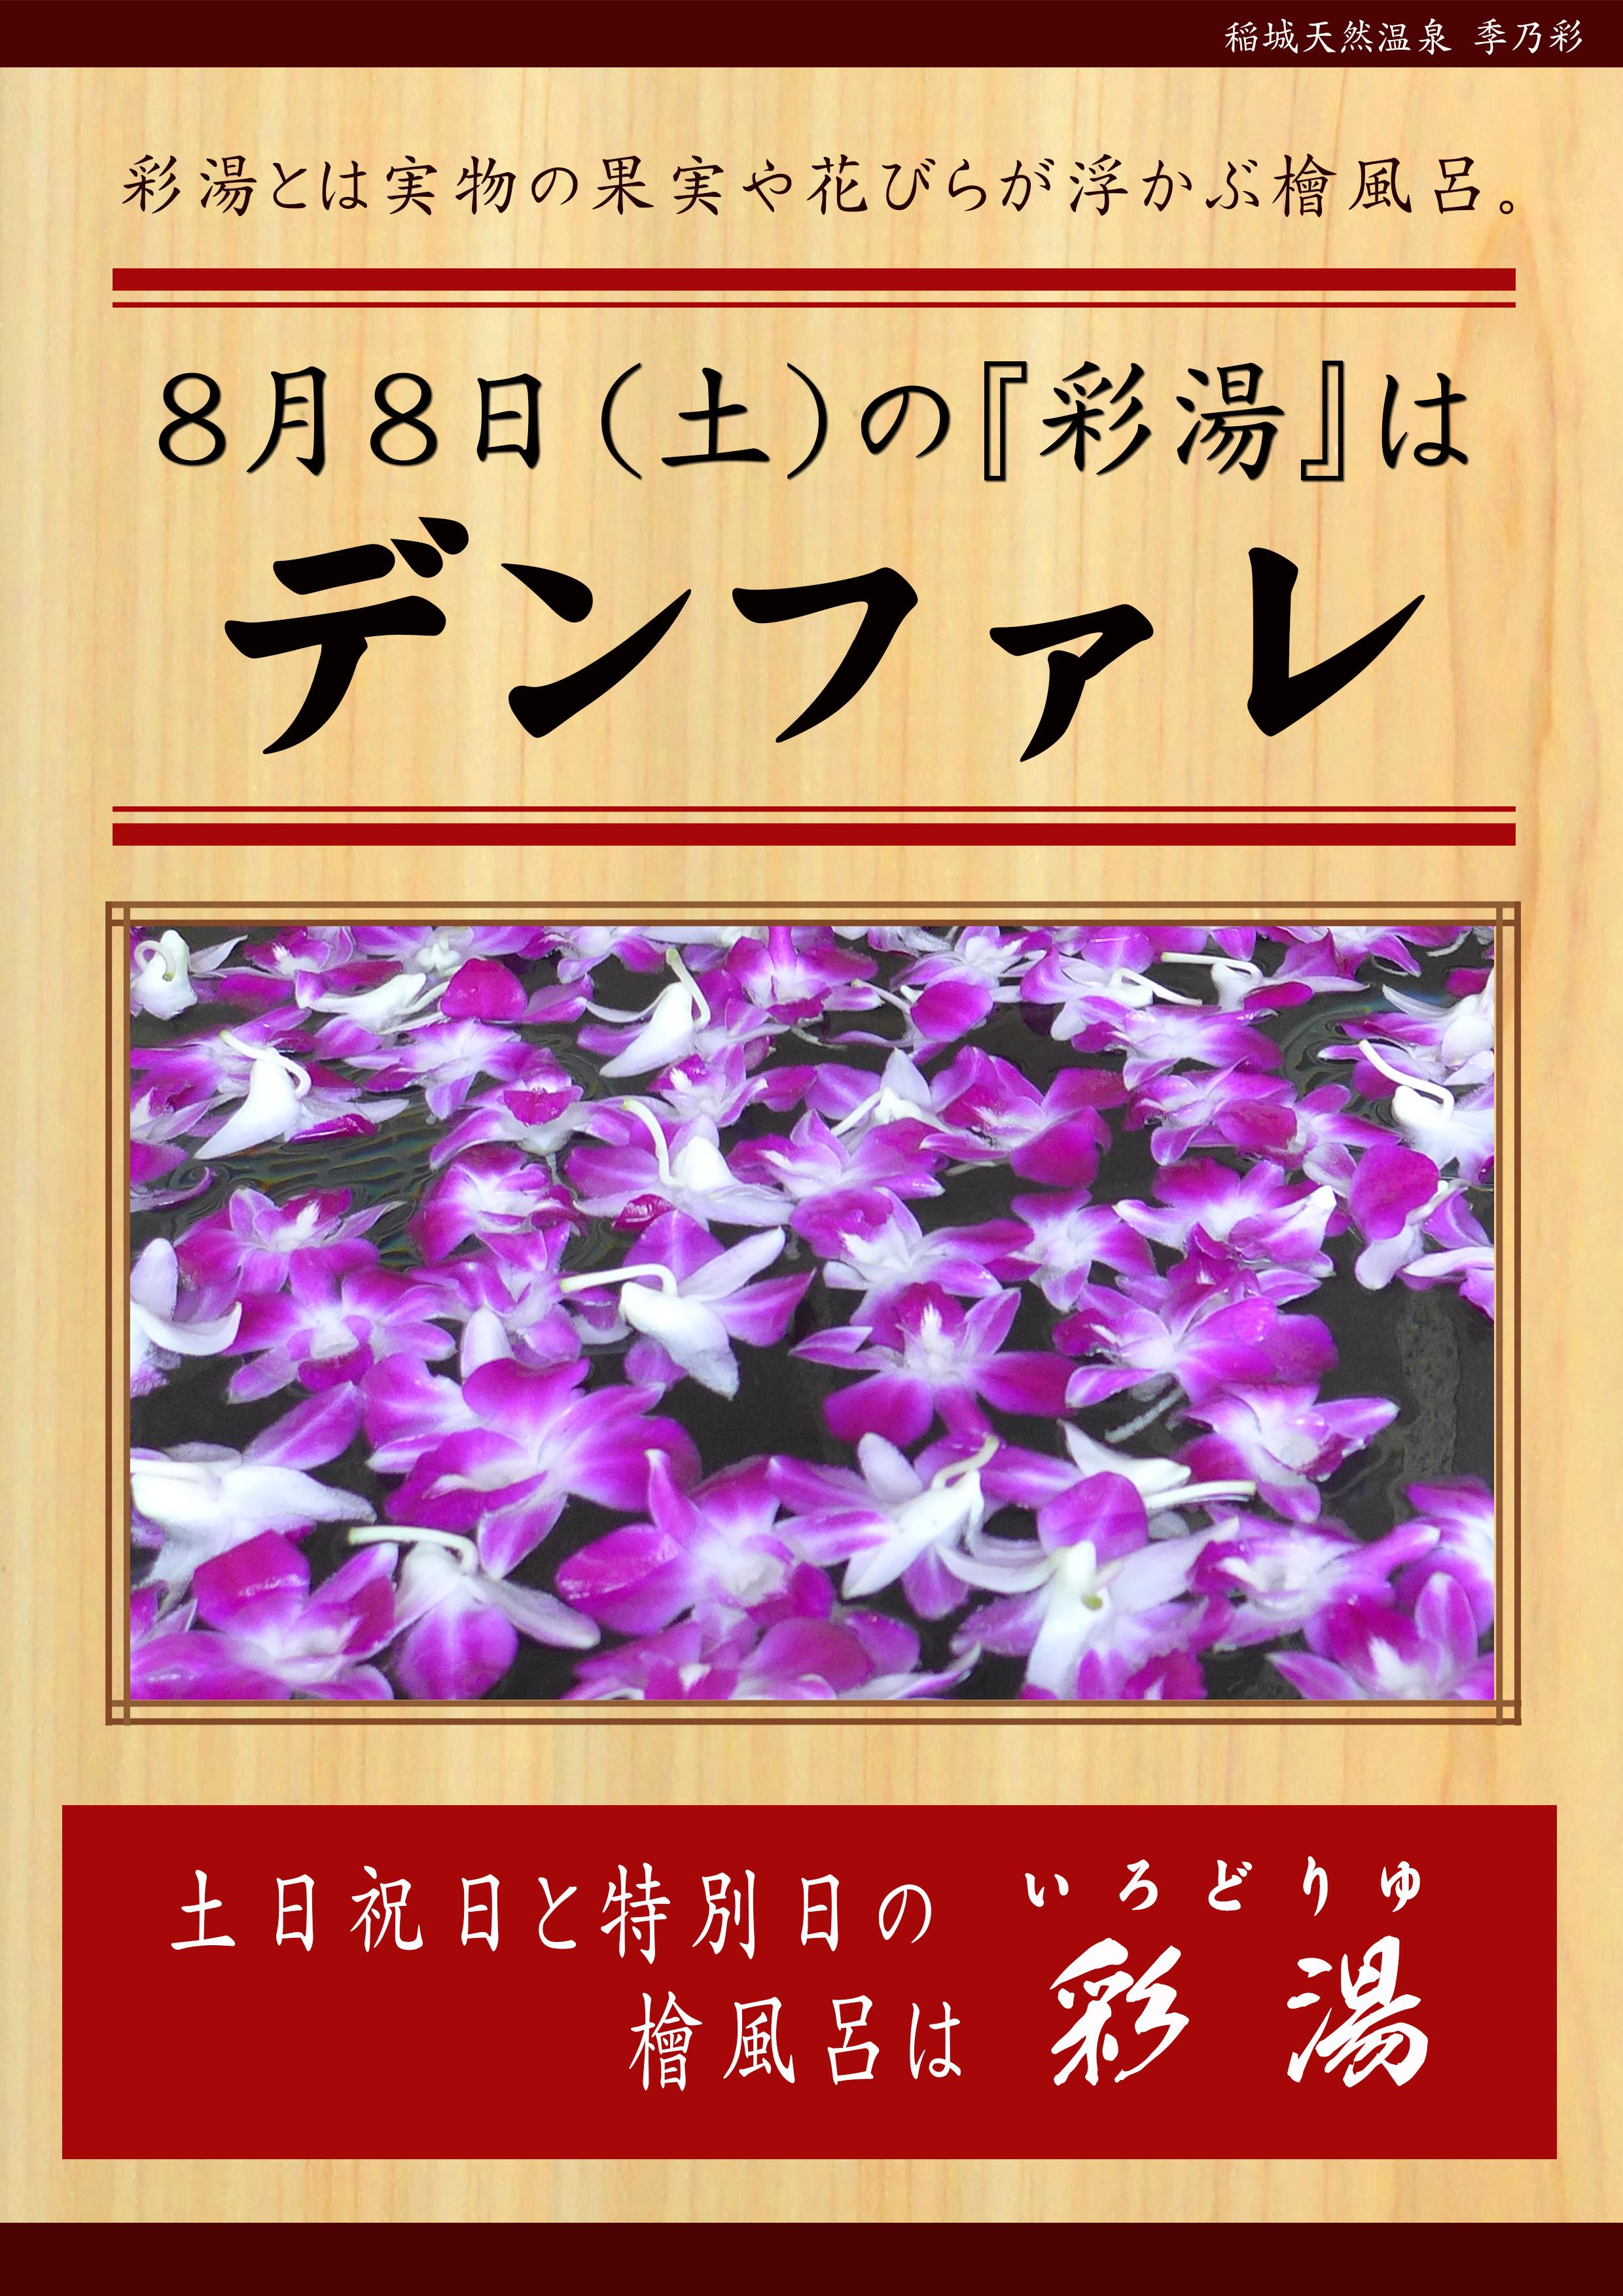 200808 POP イベント 彩湯 男女湯 デンファレ